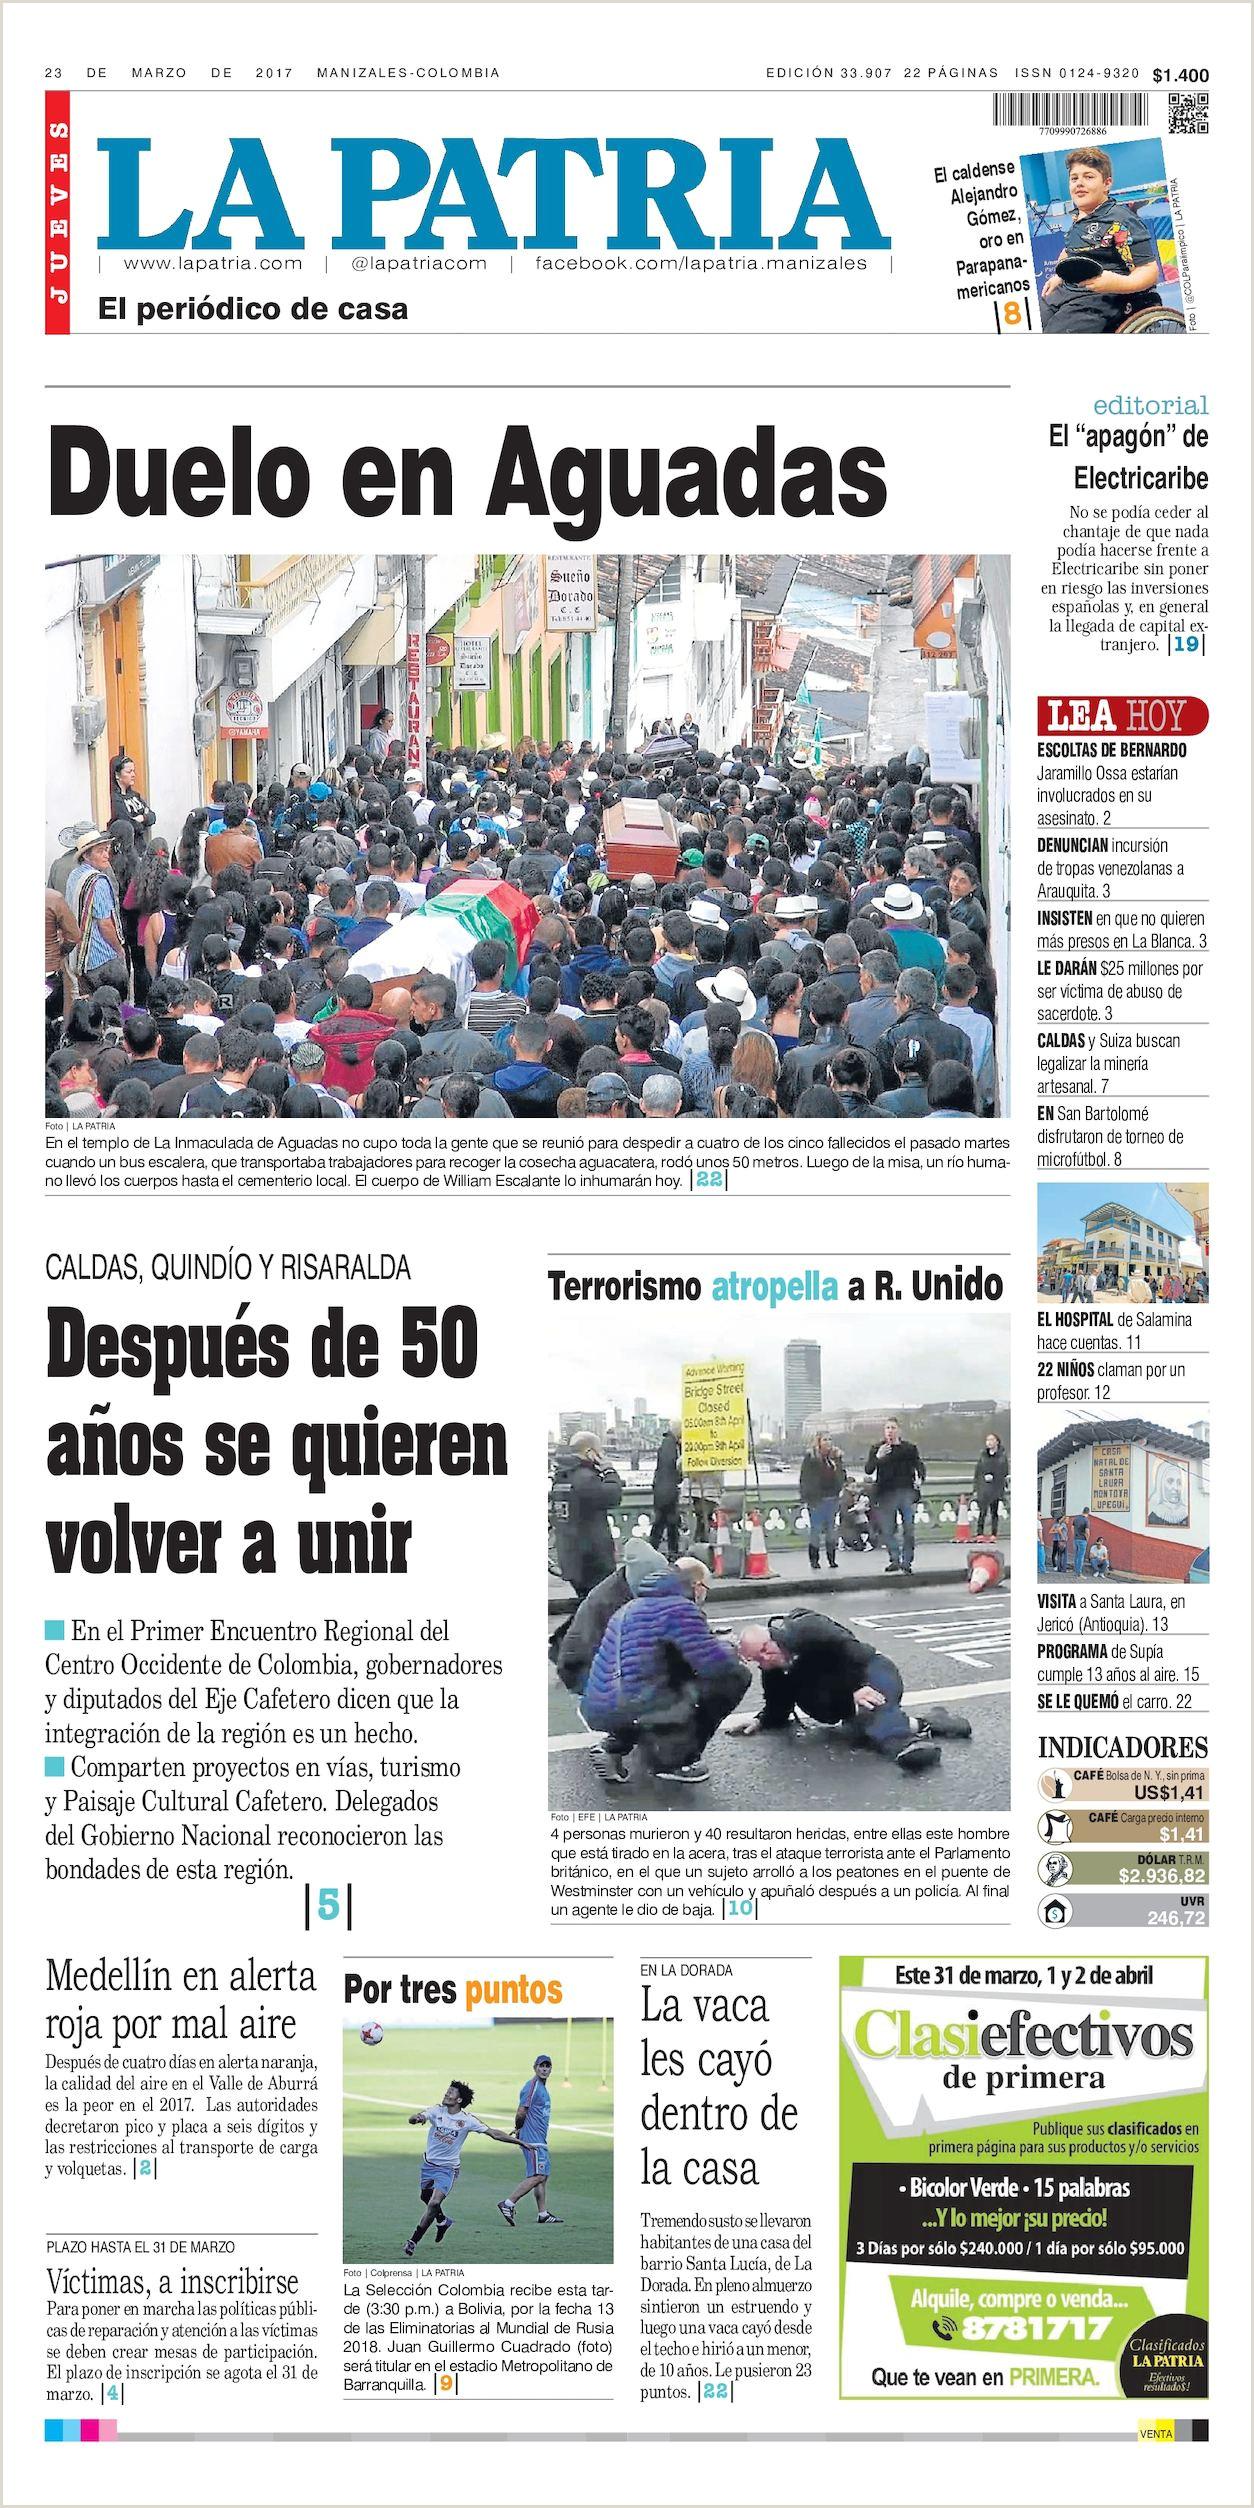 Formato Unico De Hoja De Vida Inpec Calaméo Portada 23 De Marzo De 2017